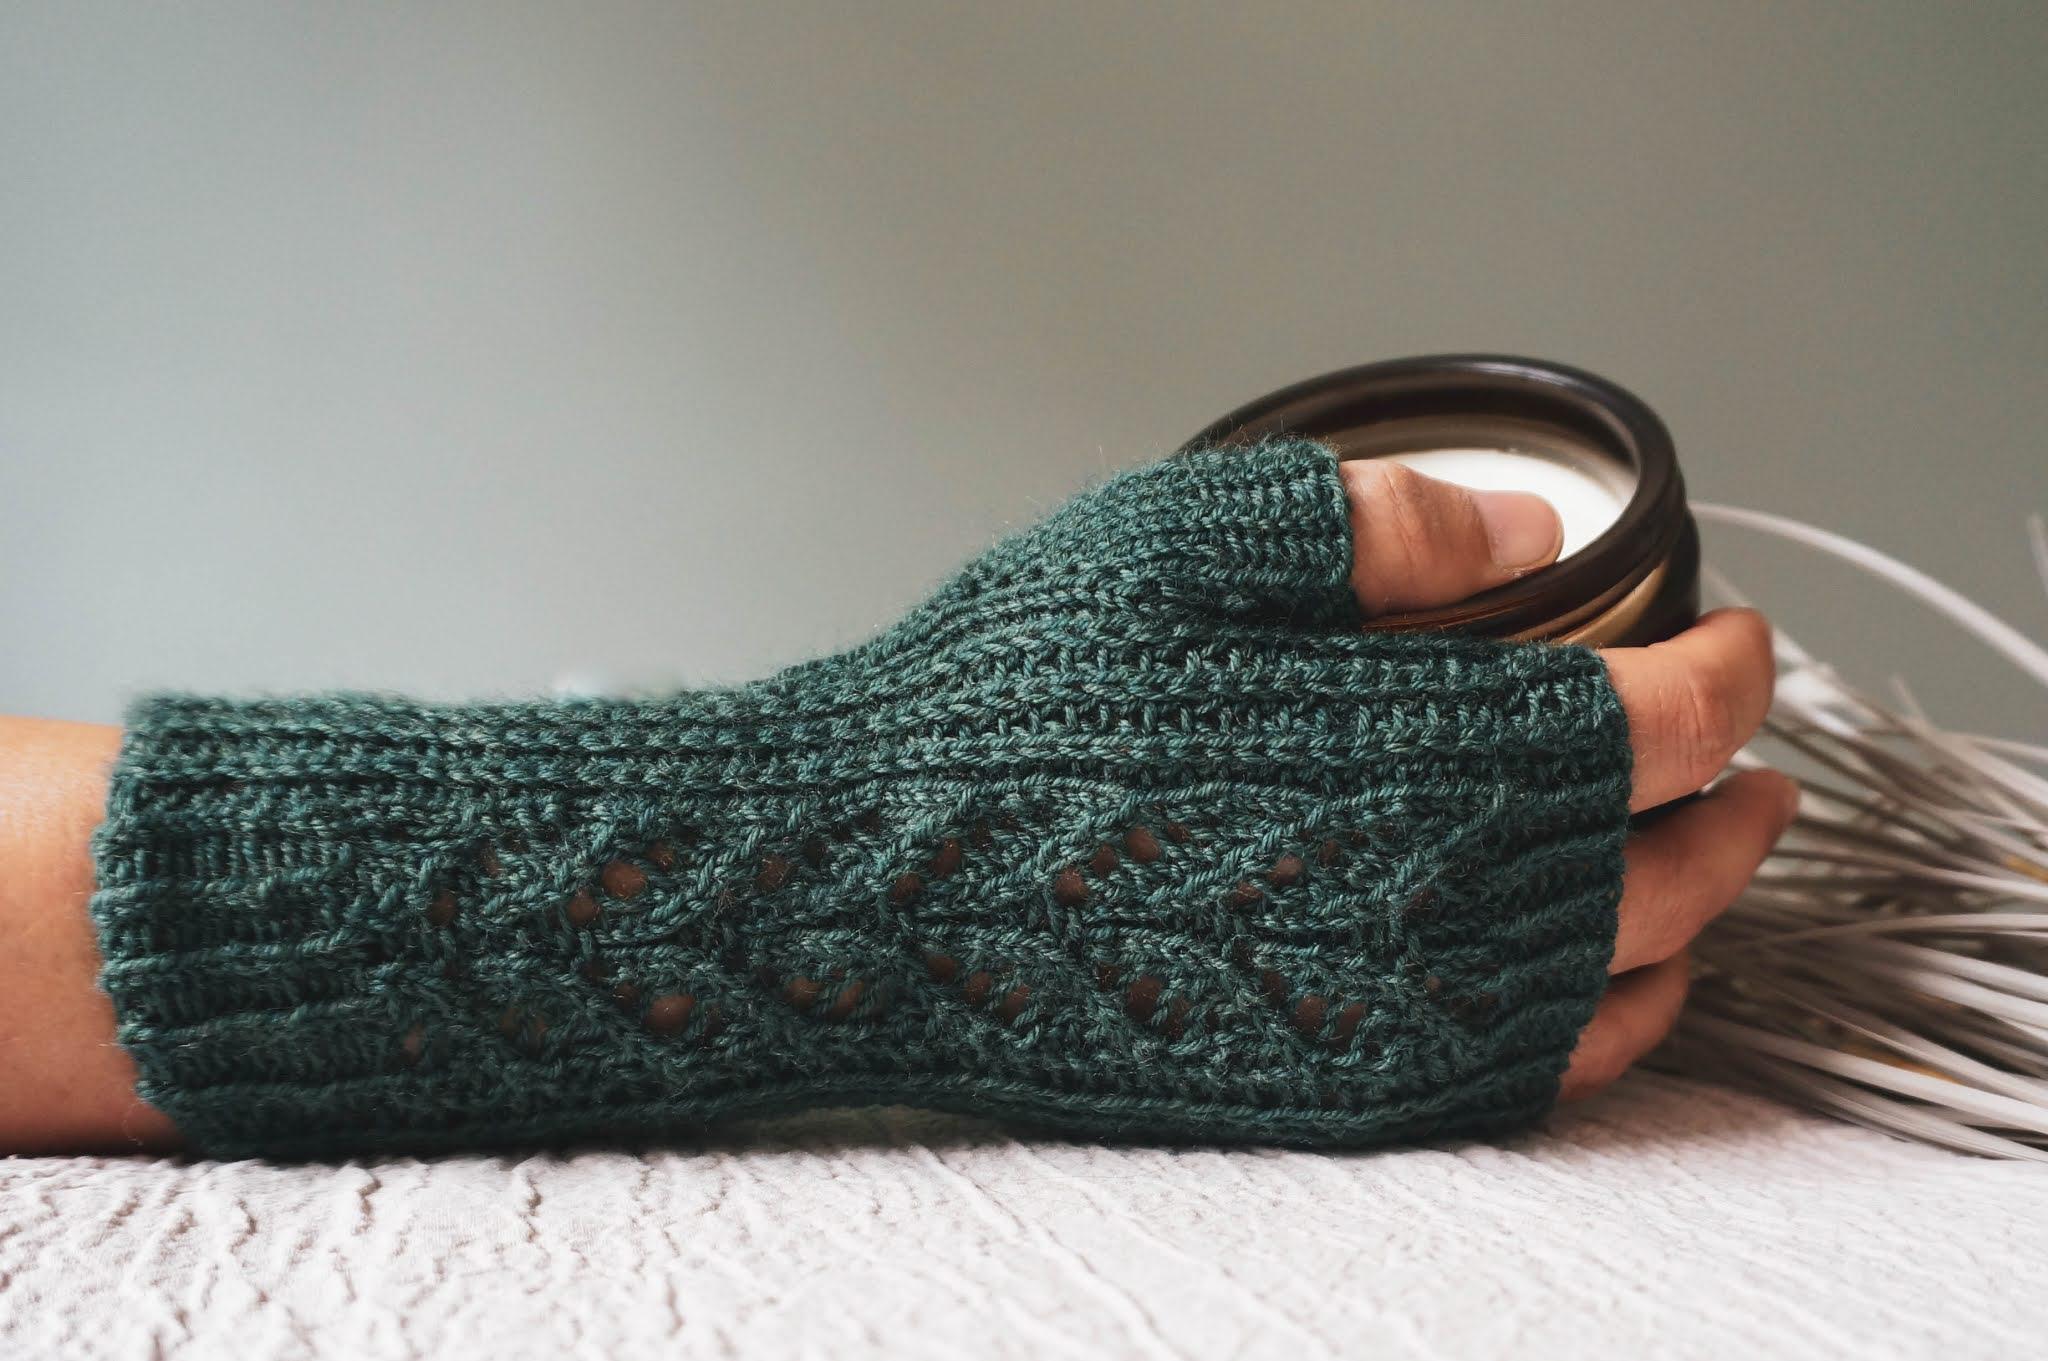 Kew Fingerless Mitts knitting pattern by West Beach Knits